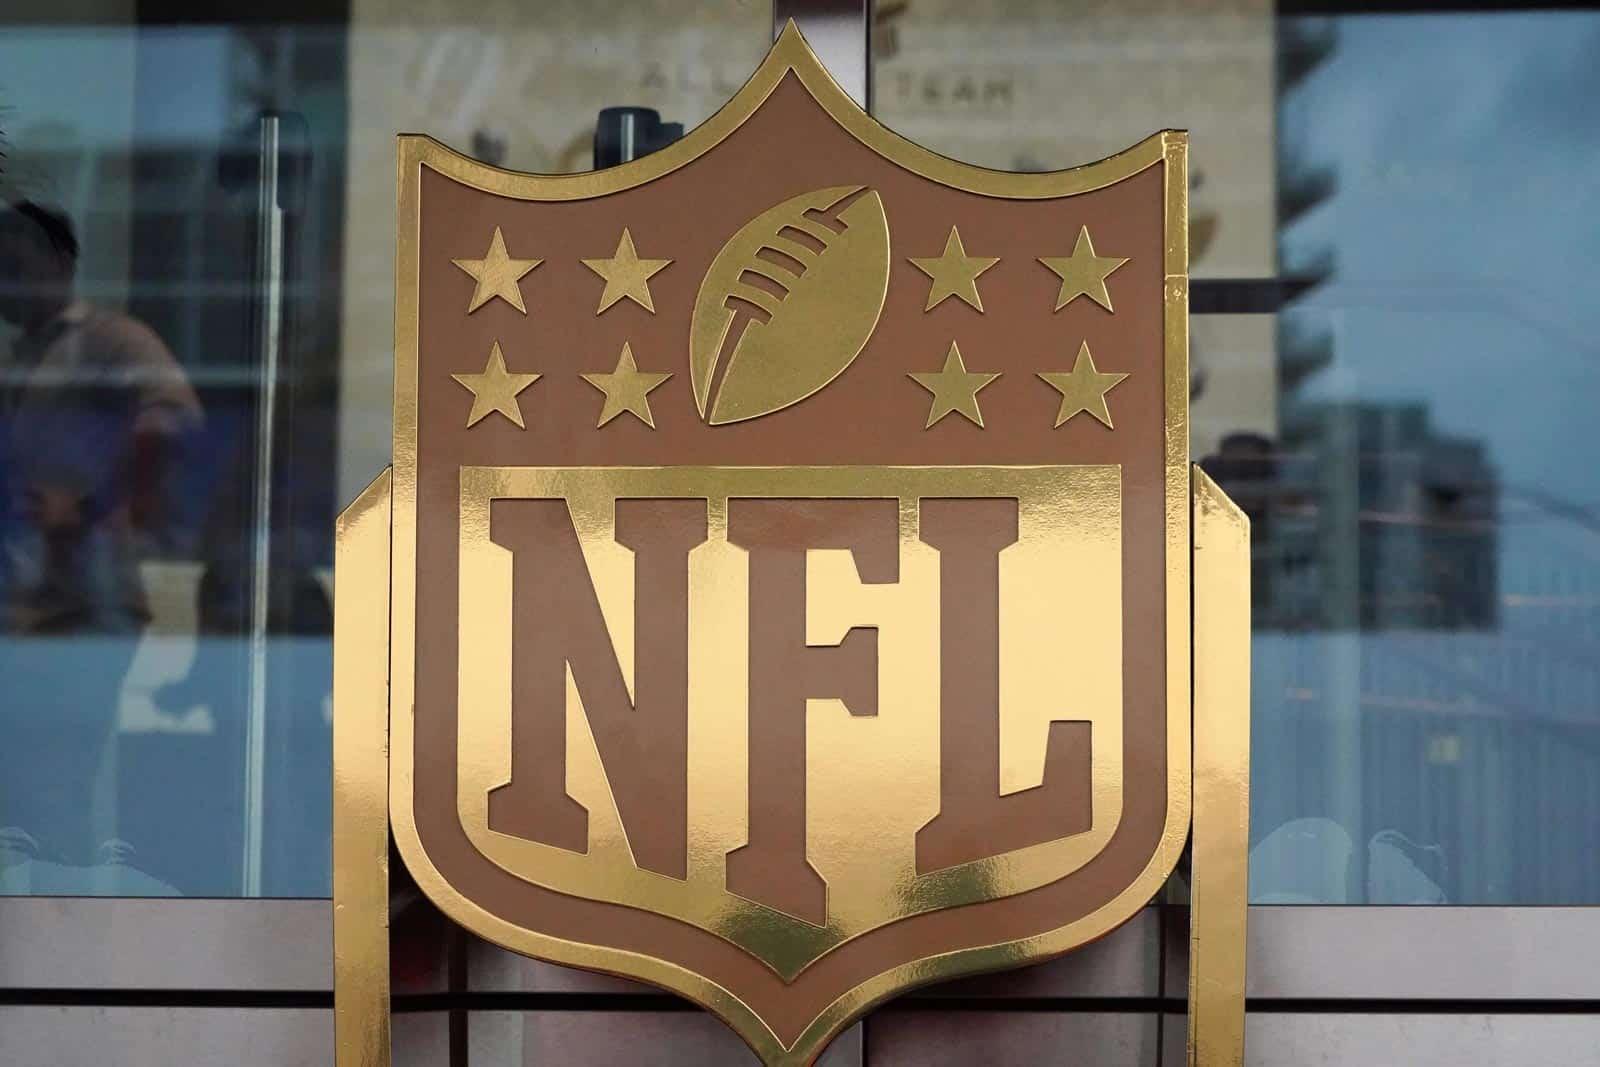 2020 NFL Preseason Schedule announced